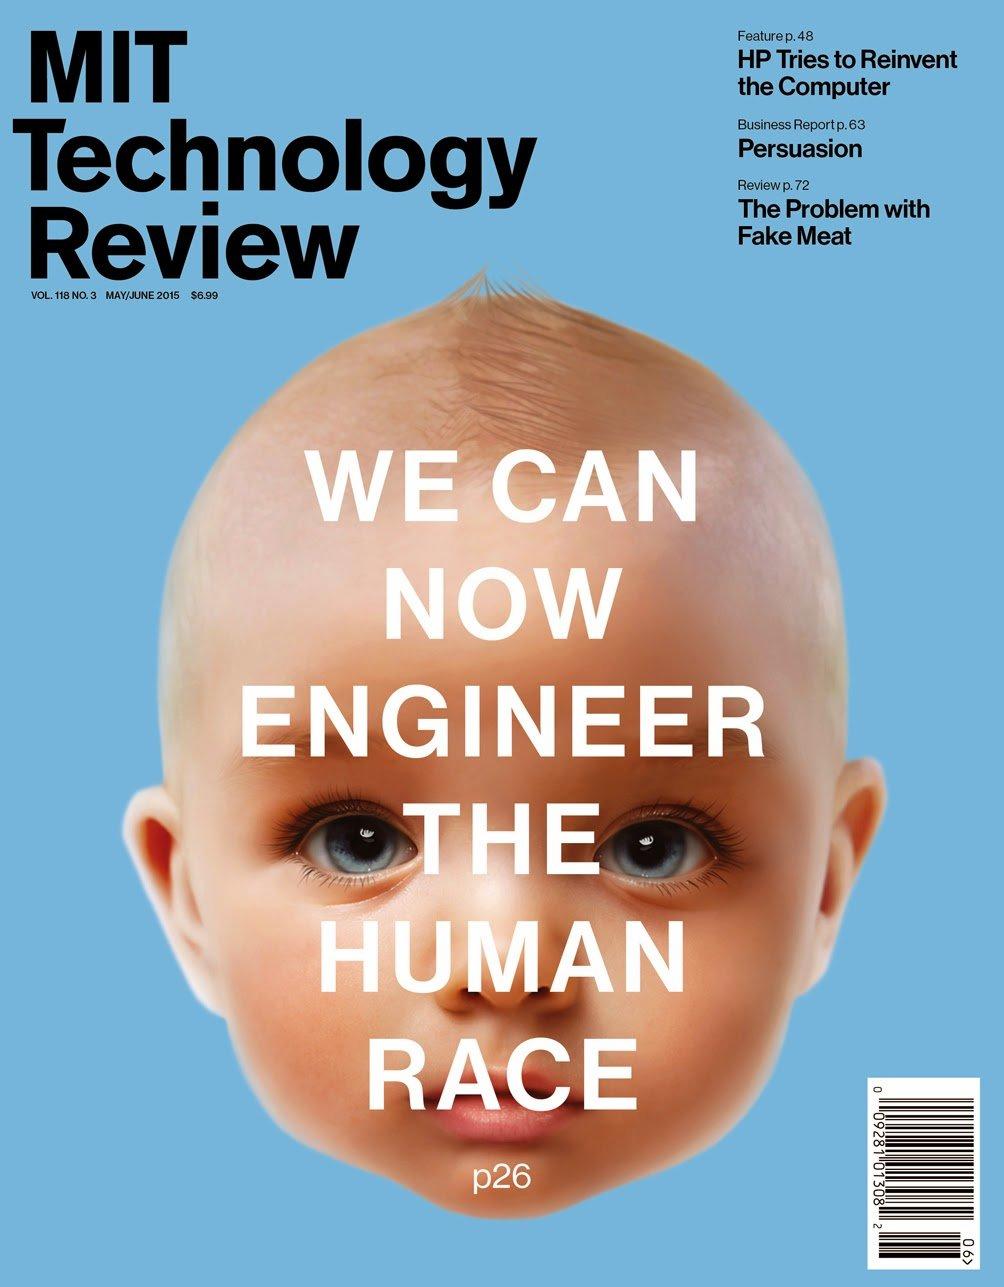 transhuman engineering